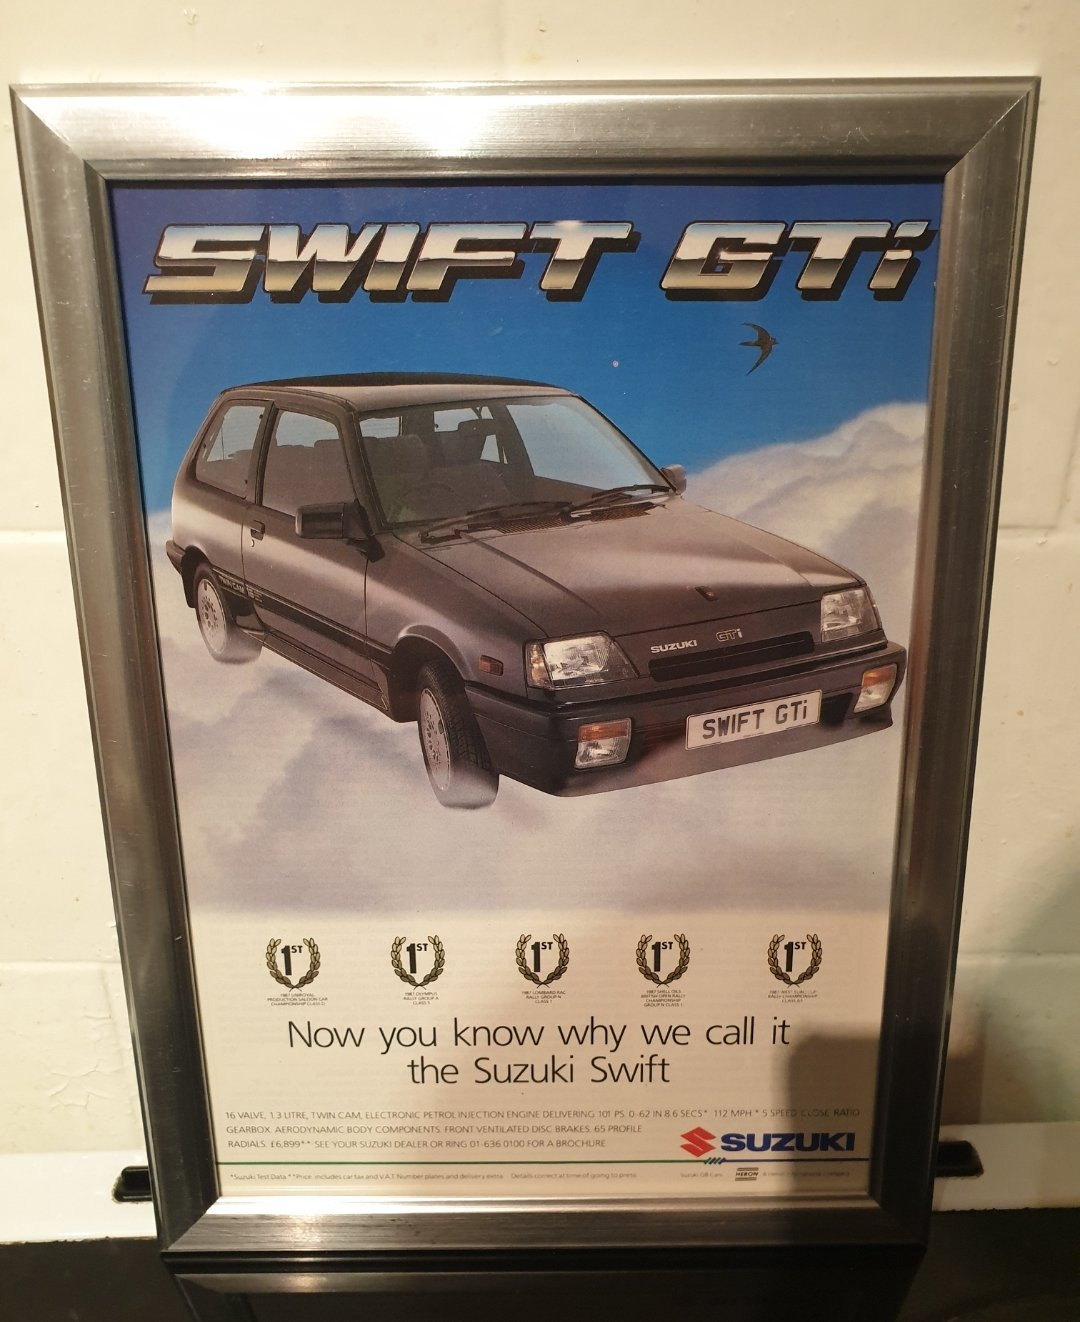 1988 Original Suzuki Swift GTi Advert For Sale (picture 1 of 2)